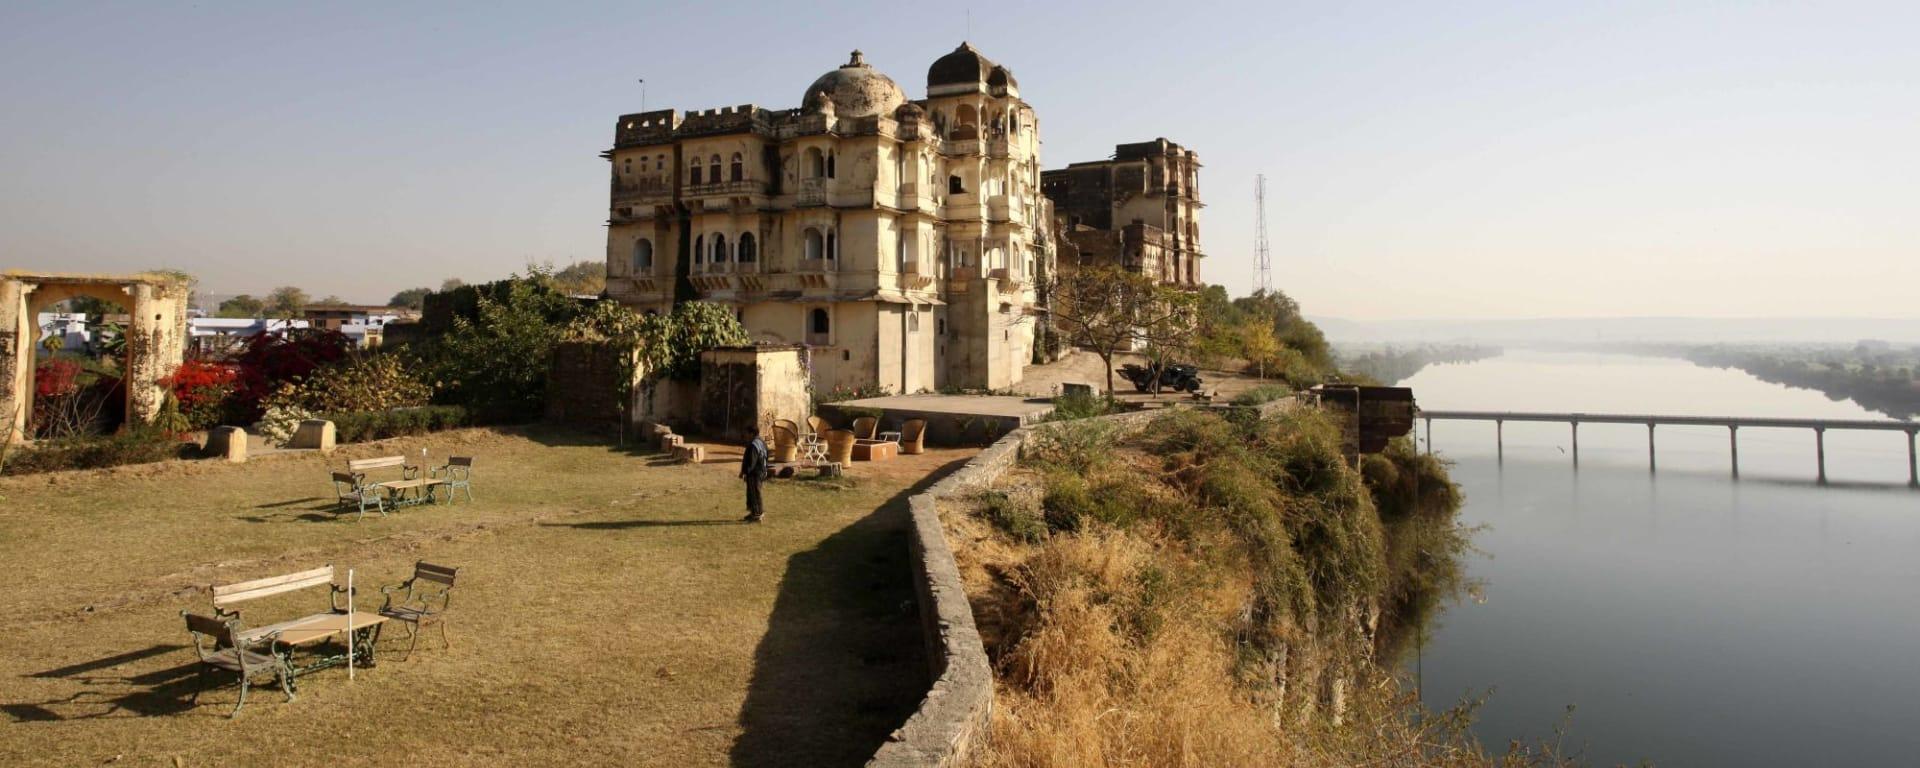 La féerie du Rajasthan de Delhi: Bhainsrorgarh Fort Hotel